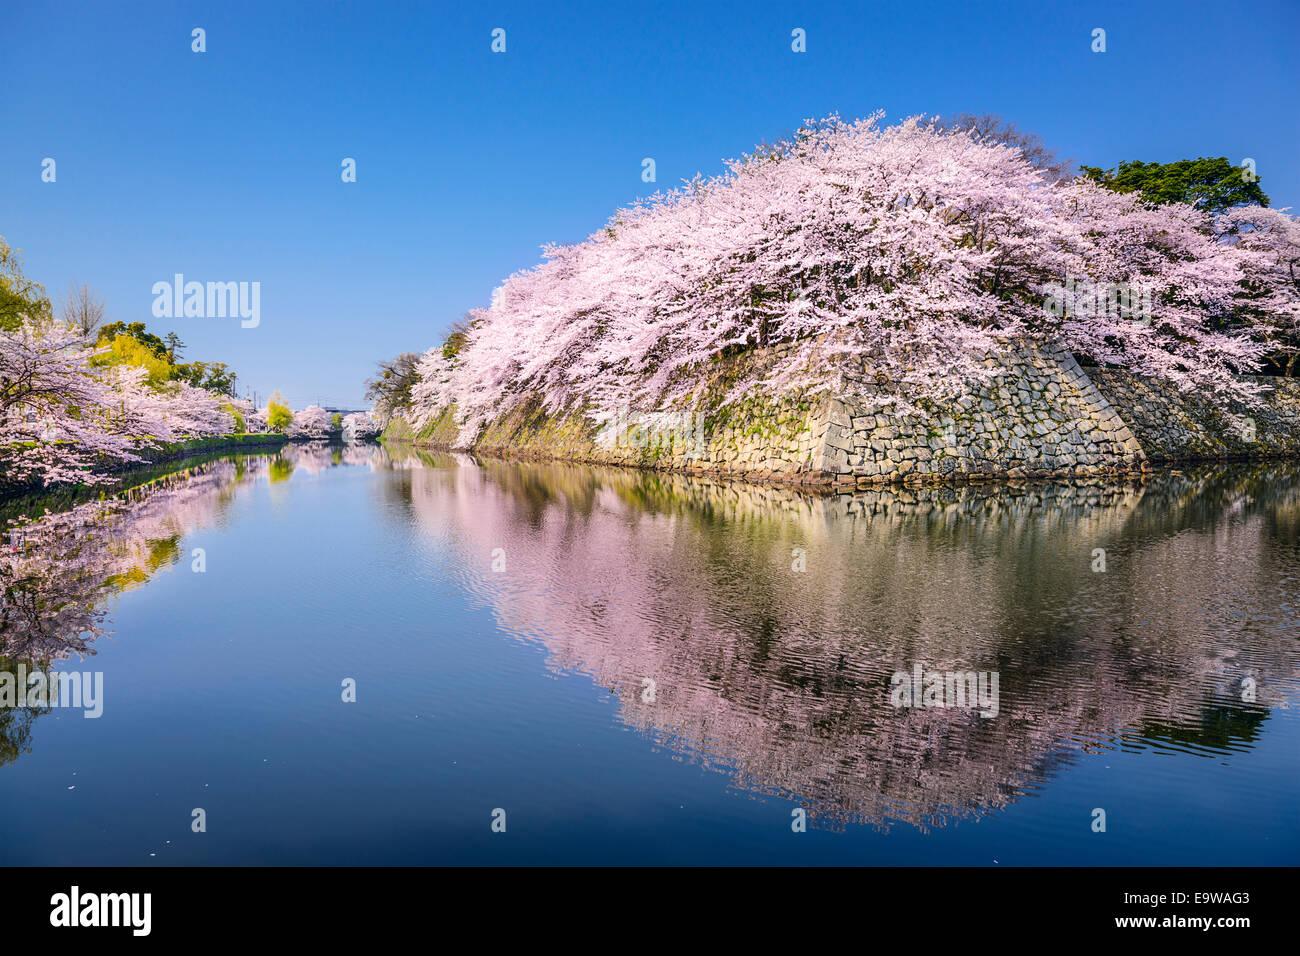 Hikone, Japan sakura cherry trees at Hikone Castle outer moat. - Stock Image